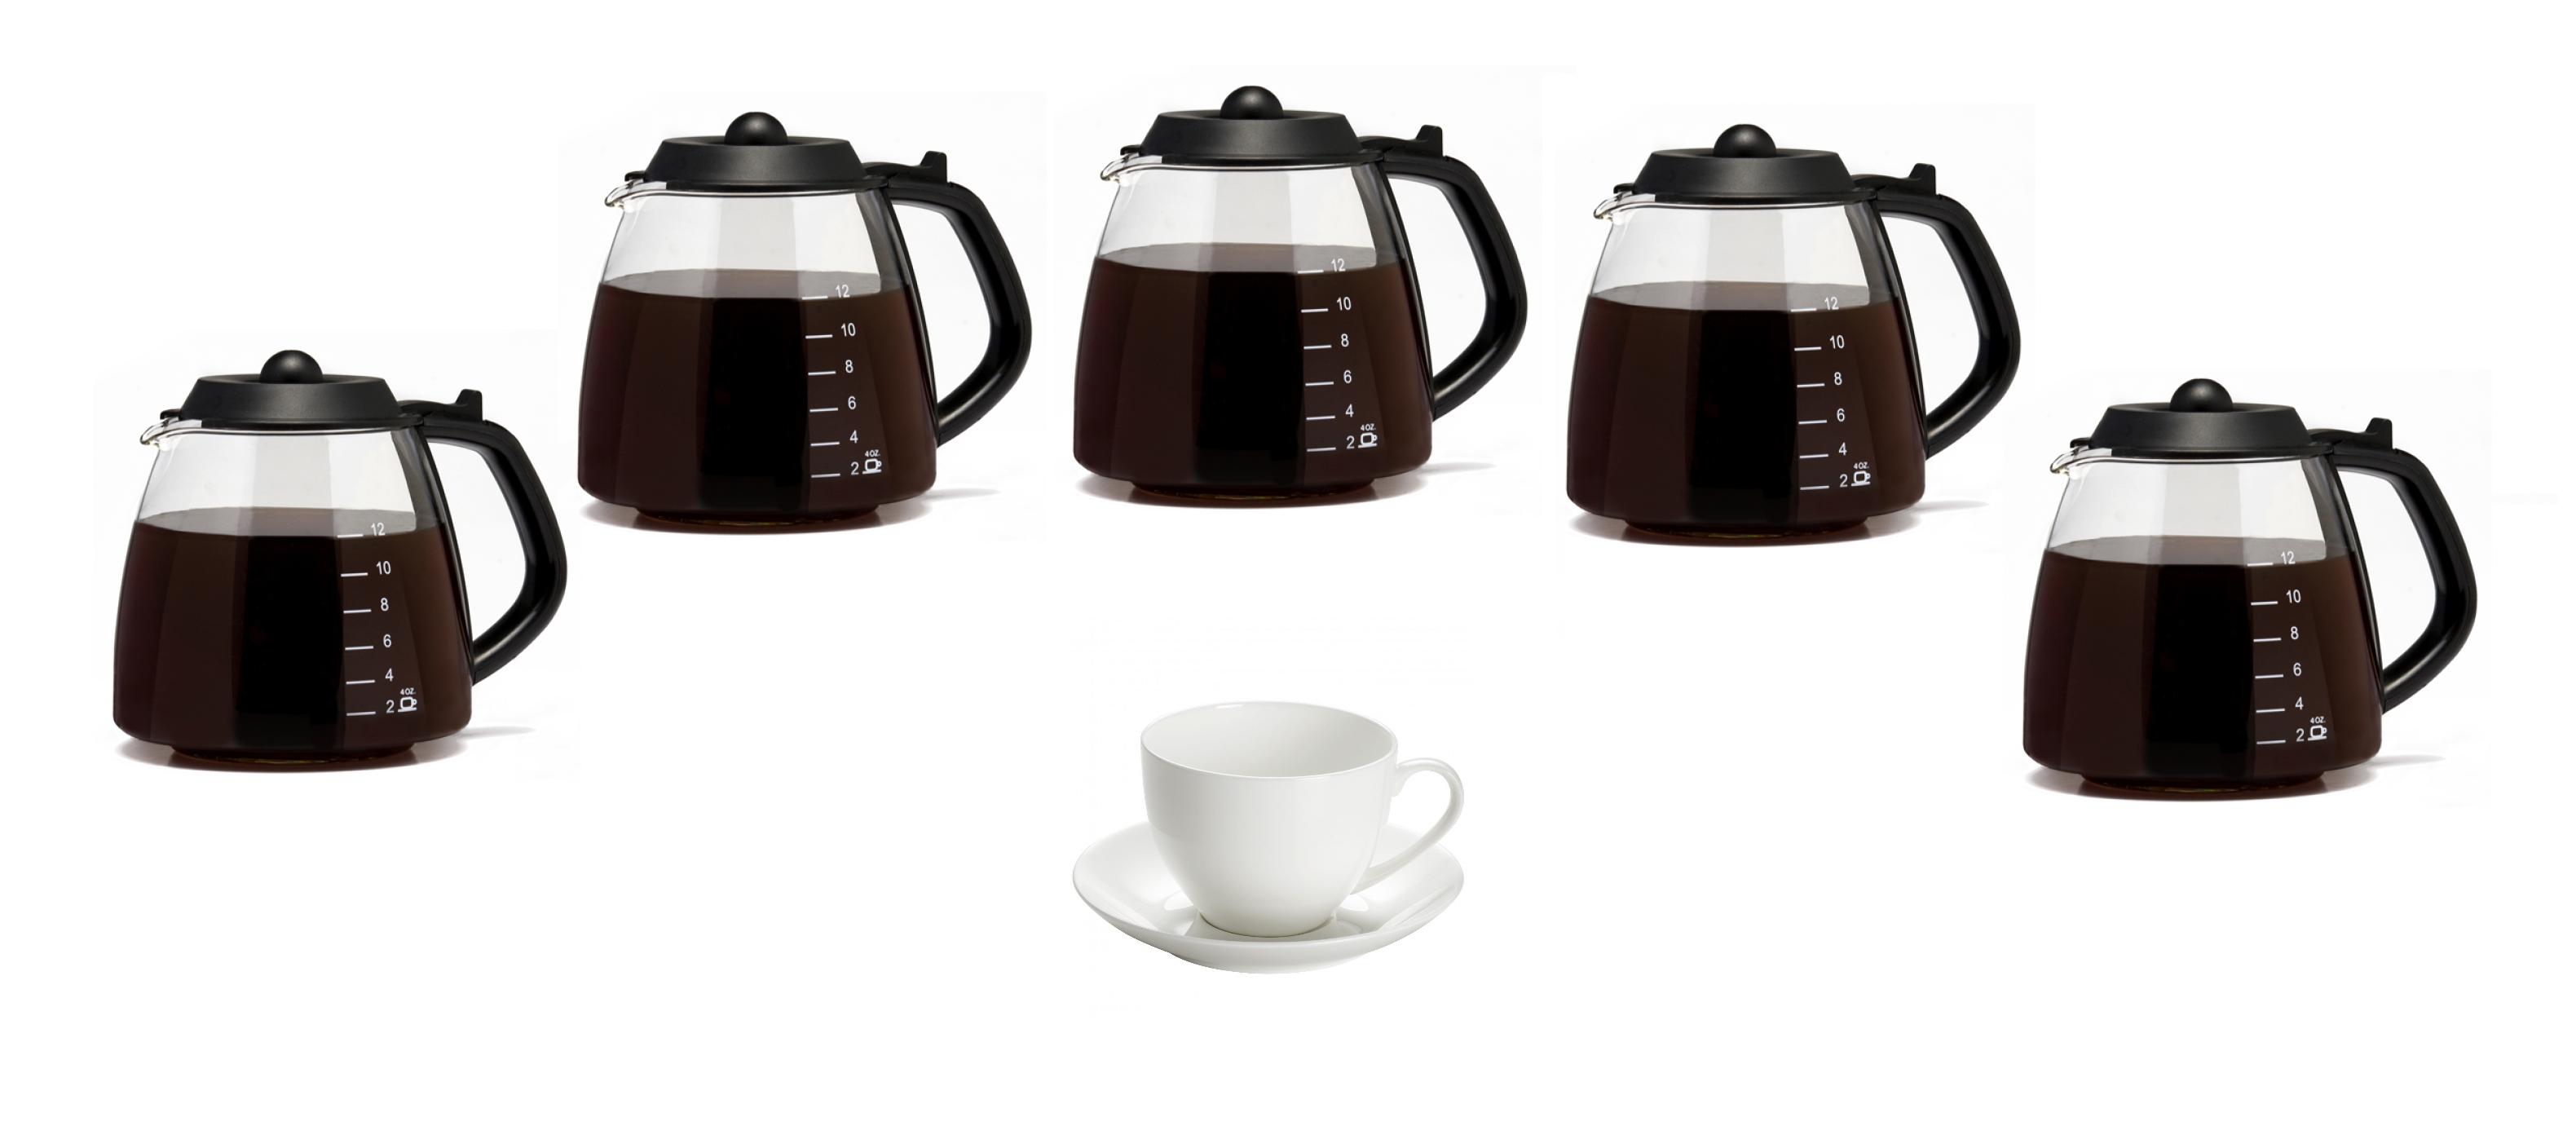 Stuff some coffee in that small cup ( ͡° ͜ʖ ͡°)